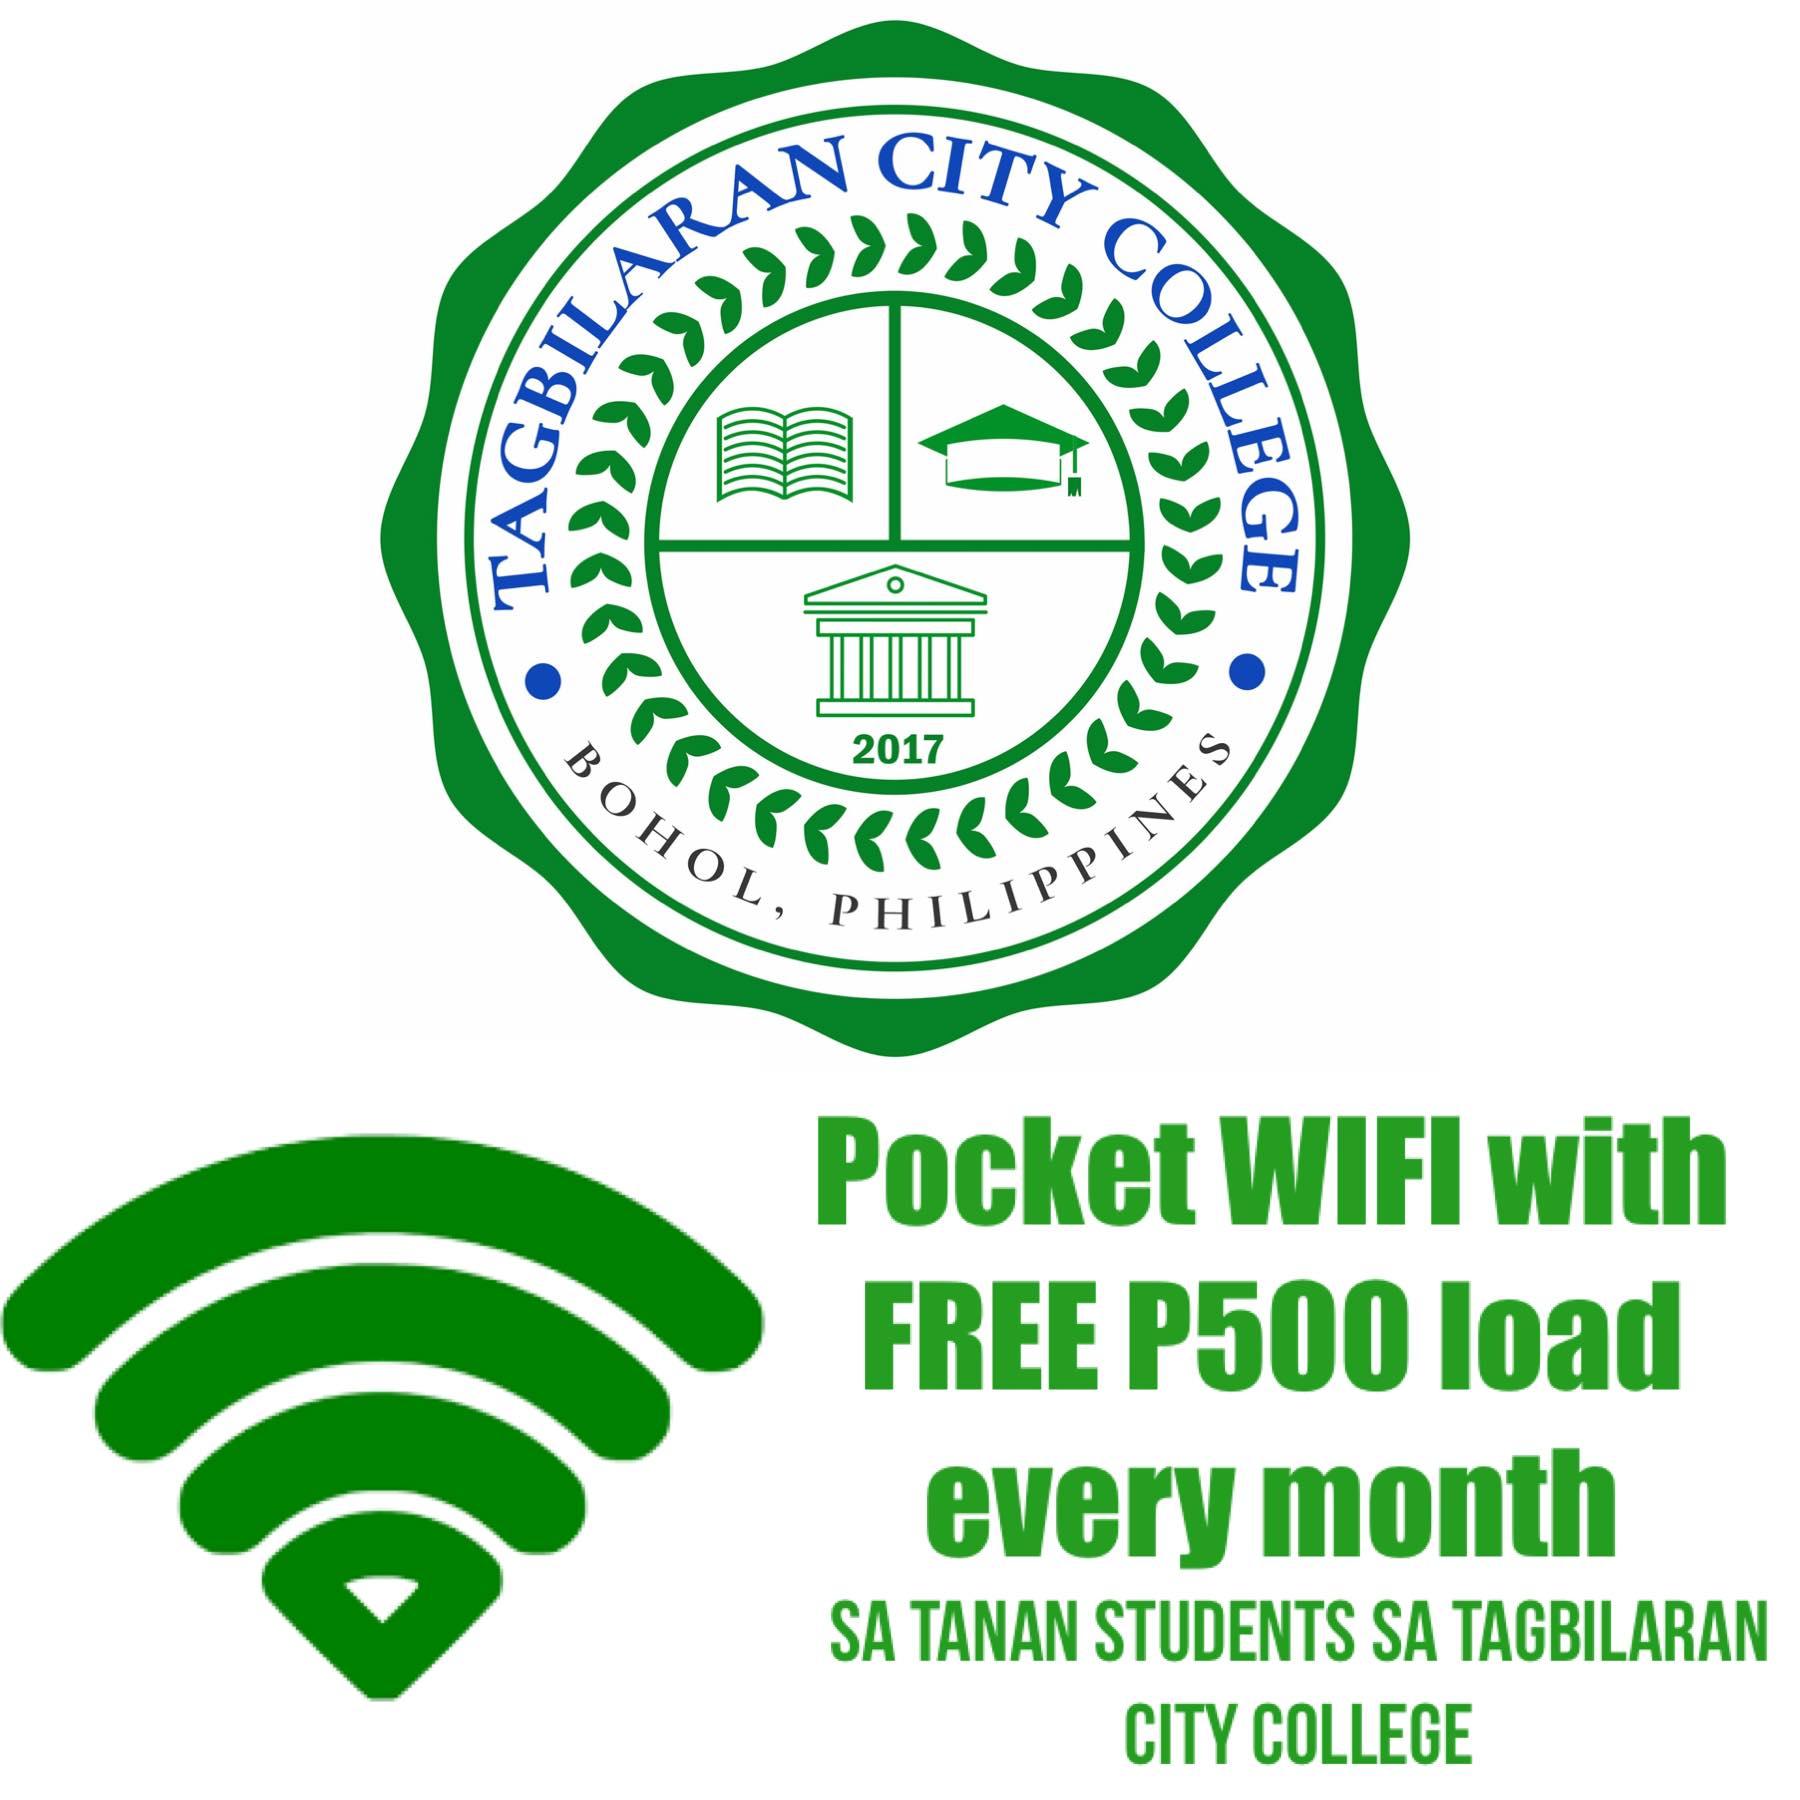 Tagbilaran City free pocket wifi